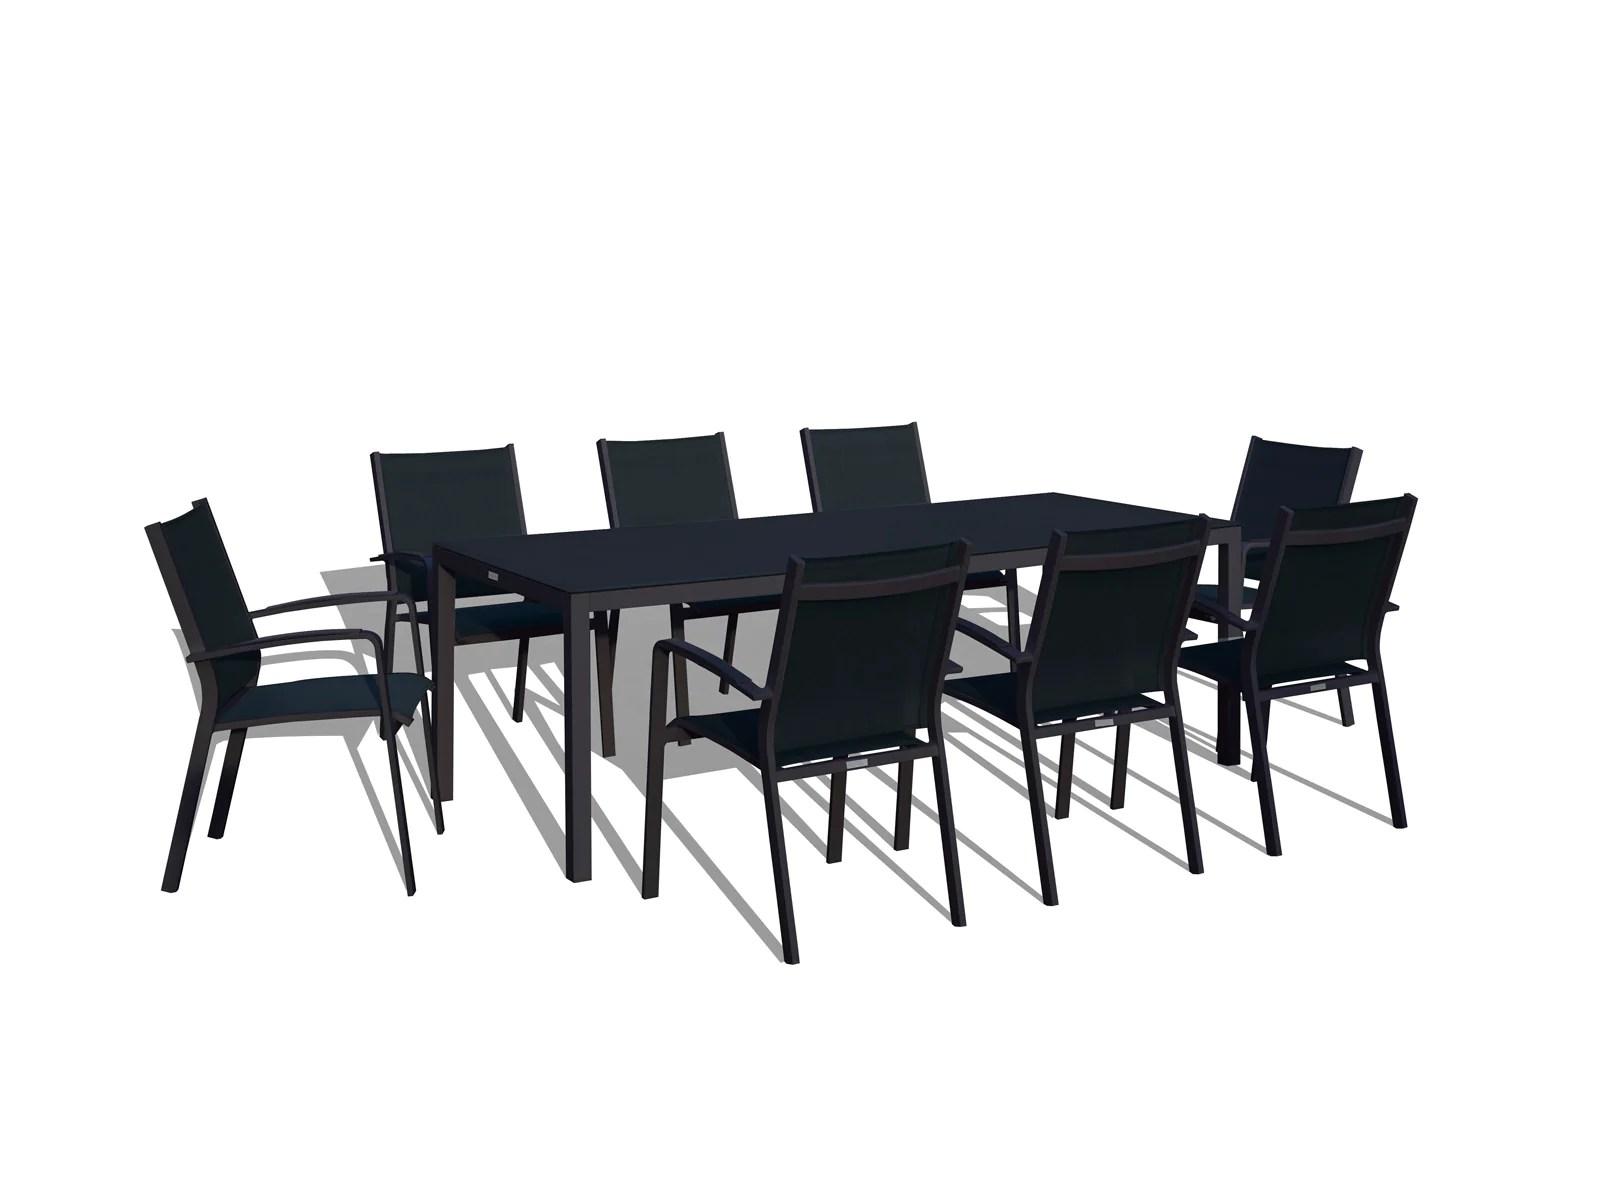 9 piece modern patio dining set black on black sold out www urbanfurnishing net